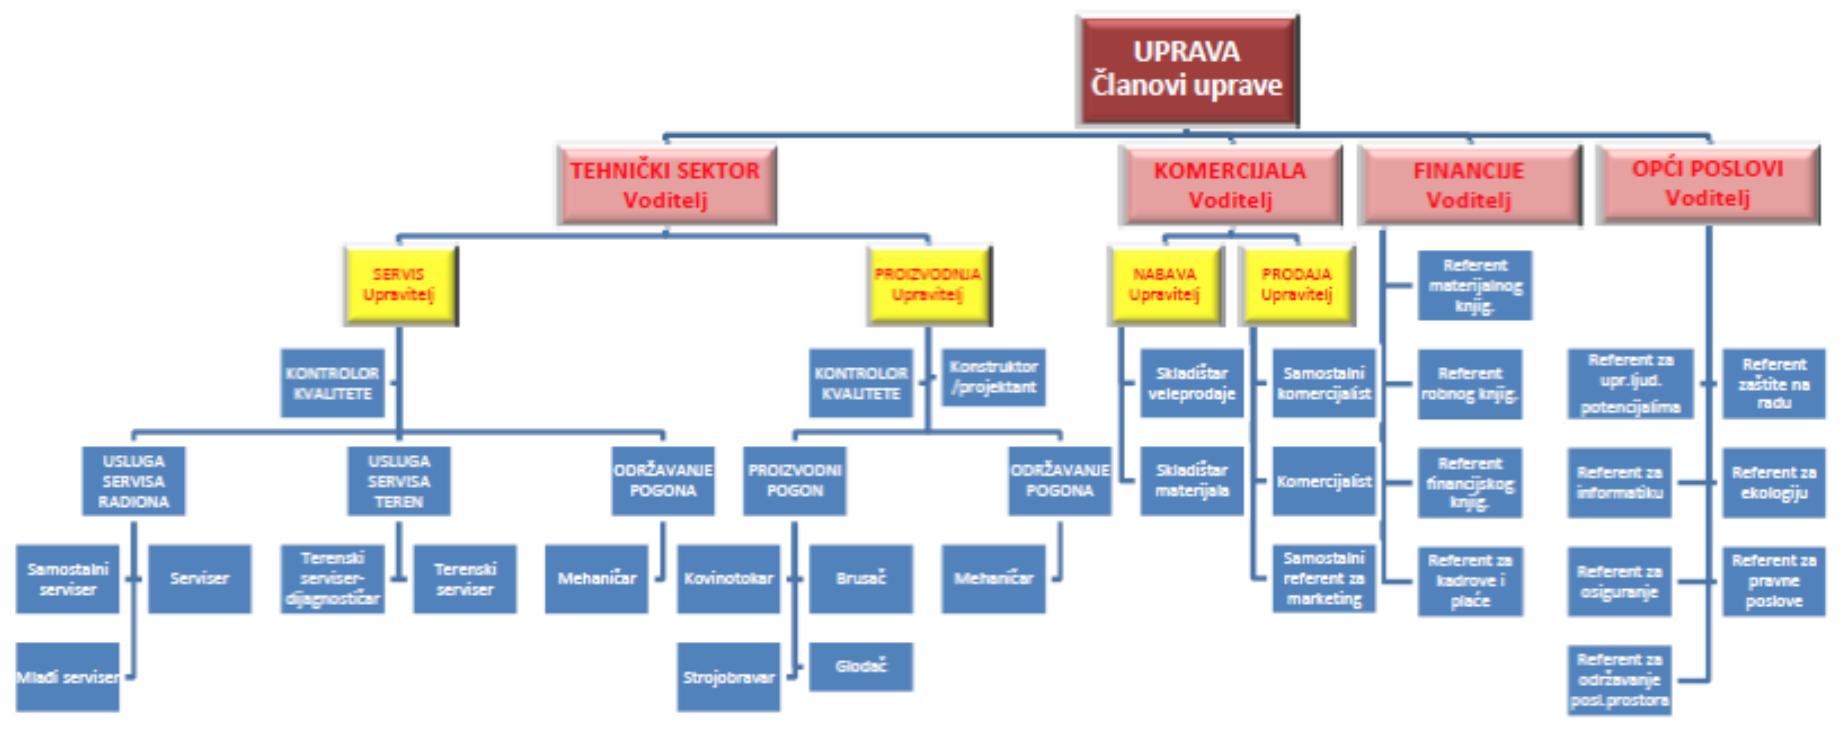 Organizacijska struktura